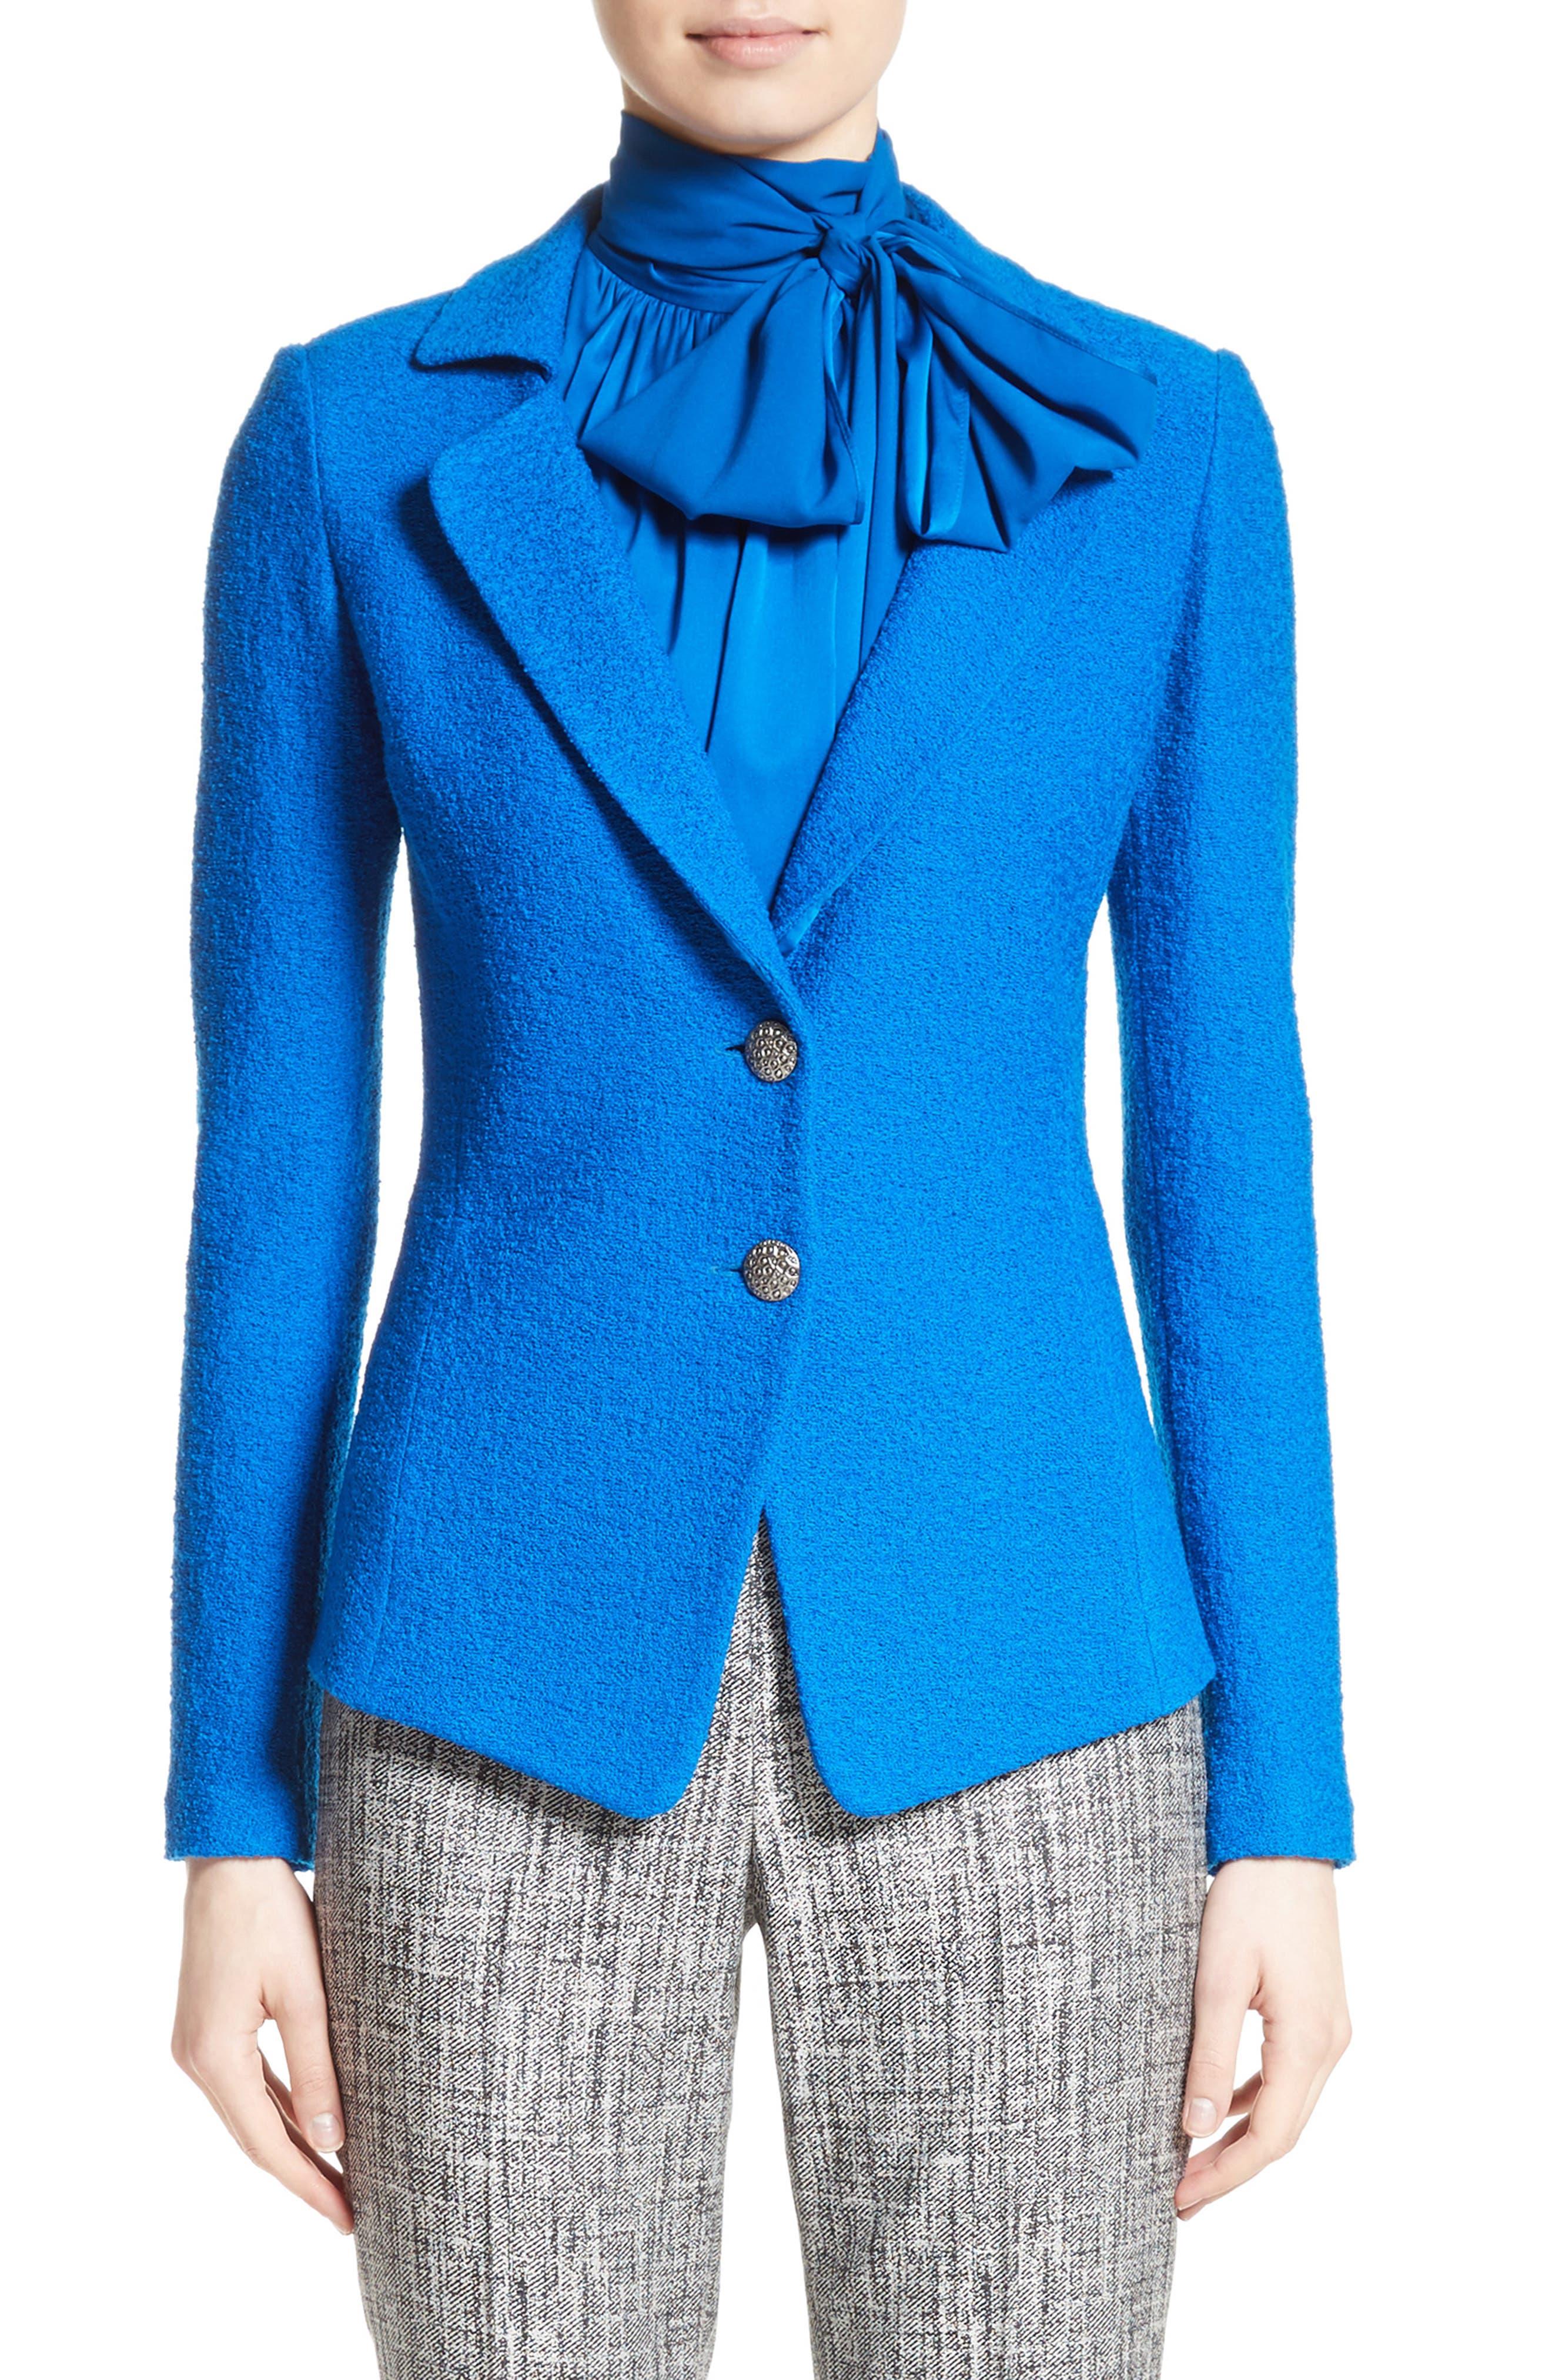 Clair Knit Peplum Jacket,                         Main,                         color,